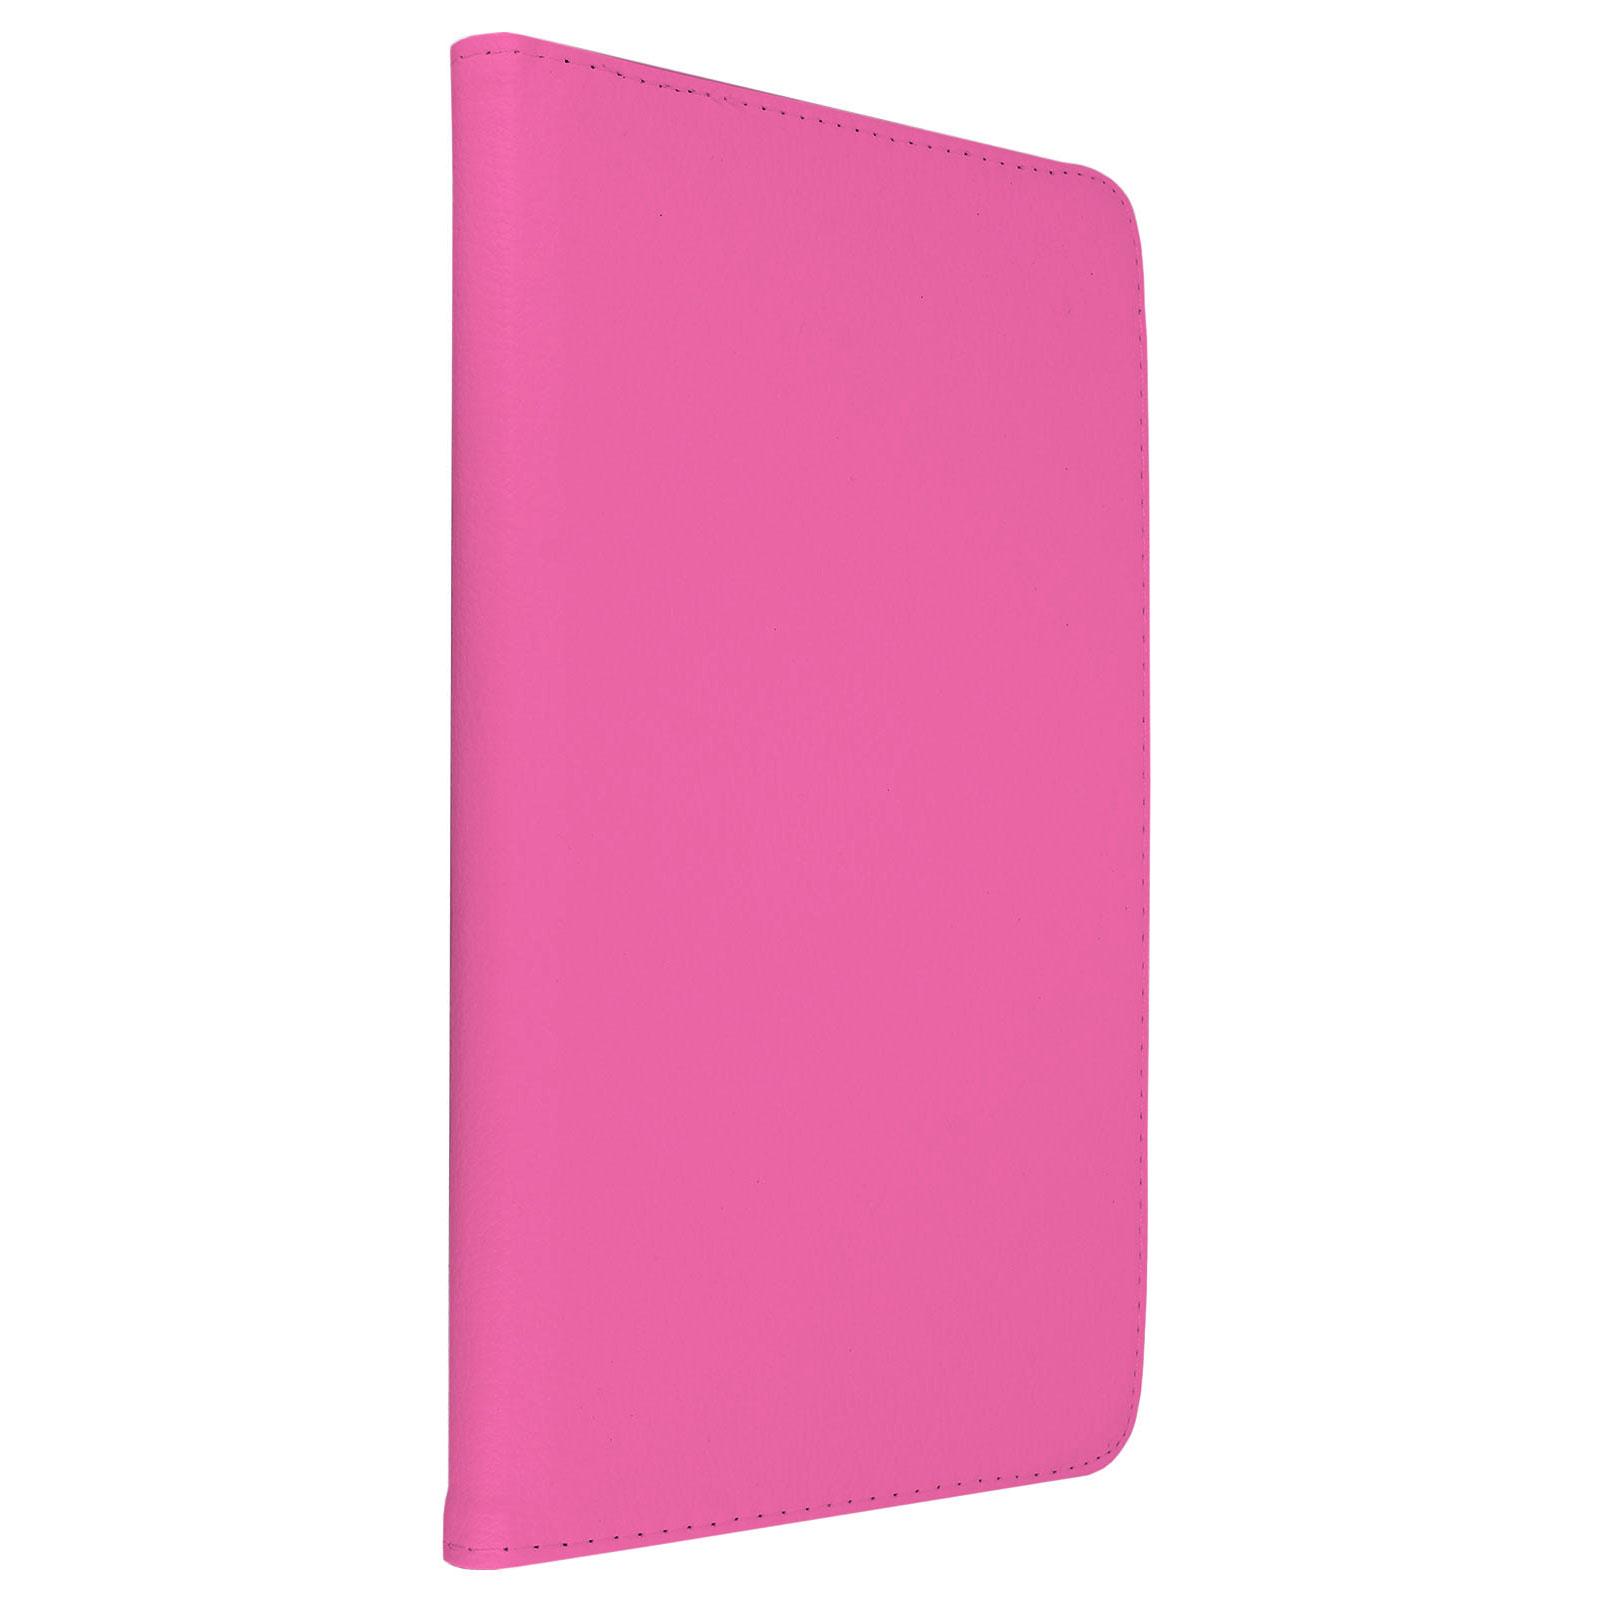 akashi folio galaxy tab a6 10 1 rose etui tablette akashi sur. Black Bedroom Furniture Sets. Home Design Ideas